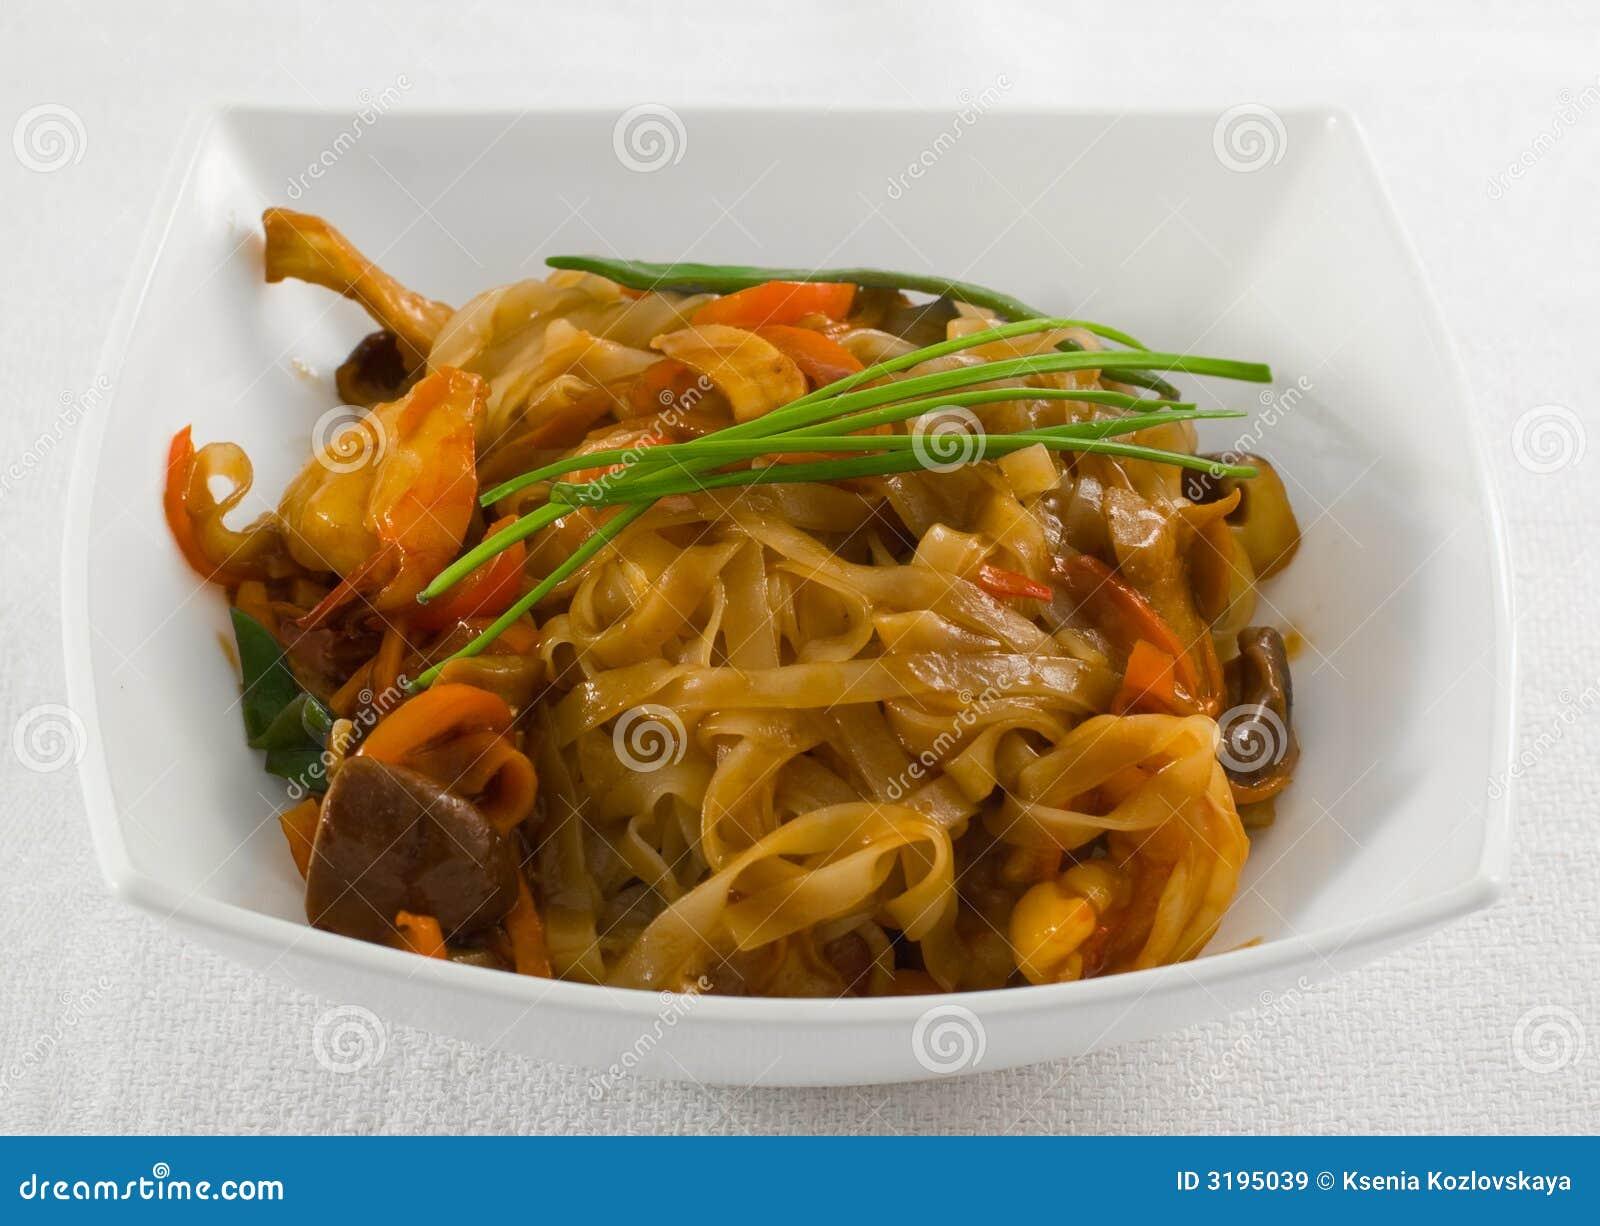 China glassy noodles